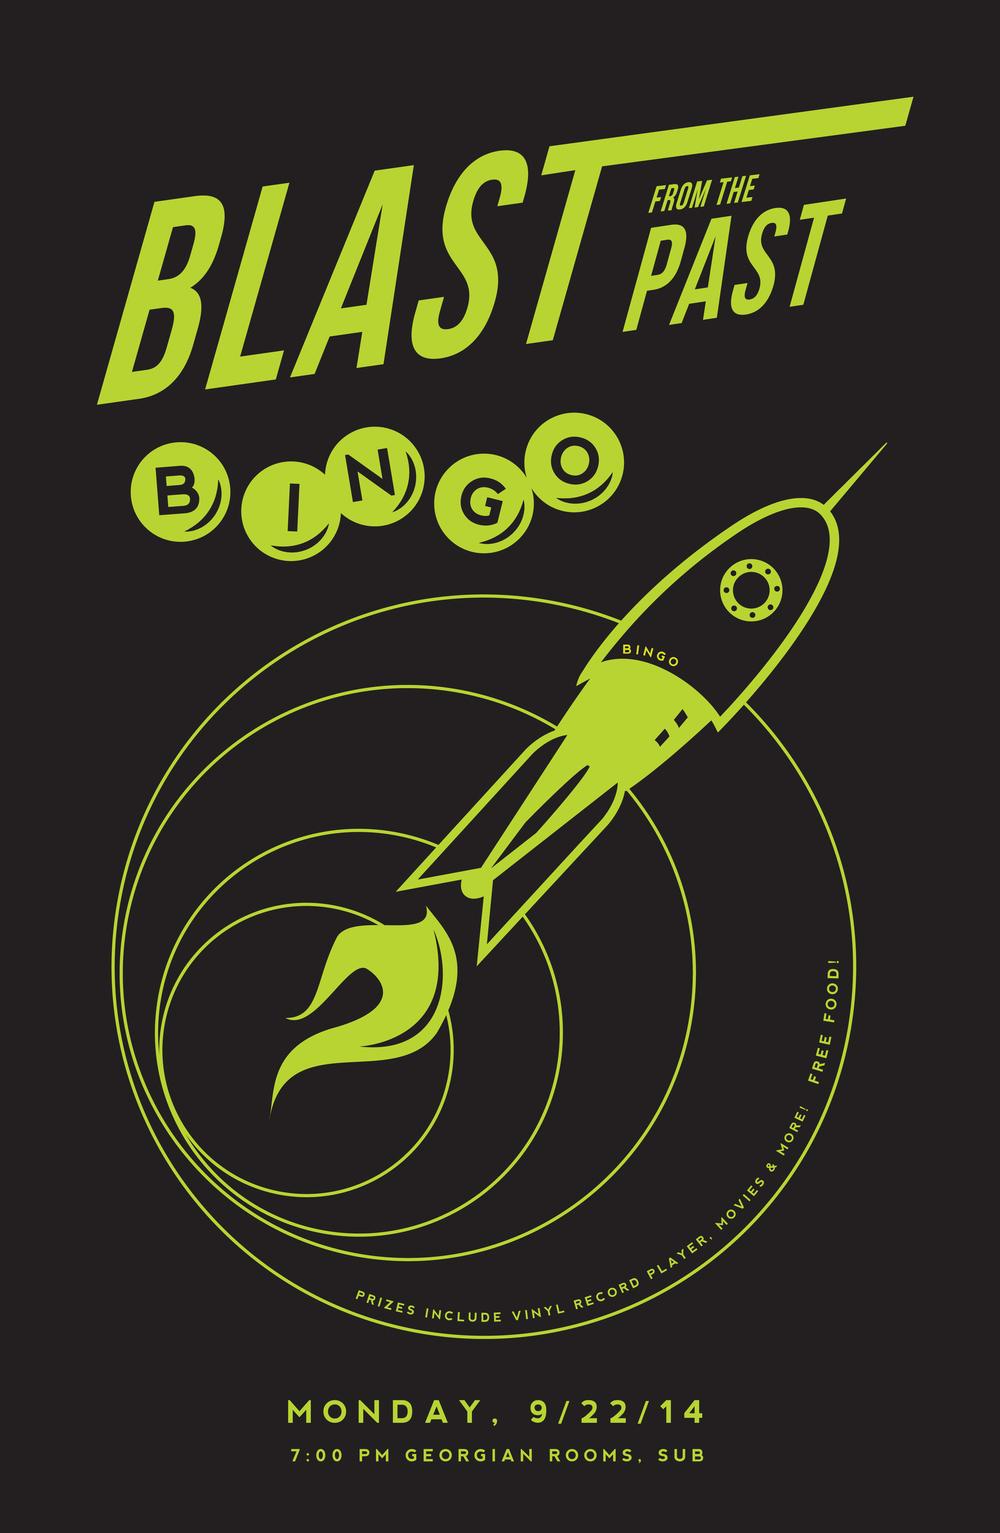 BlastBingo_poster_f14.jpg